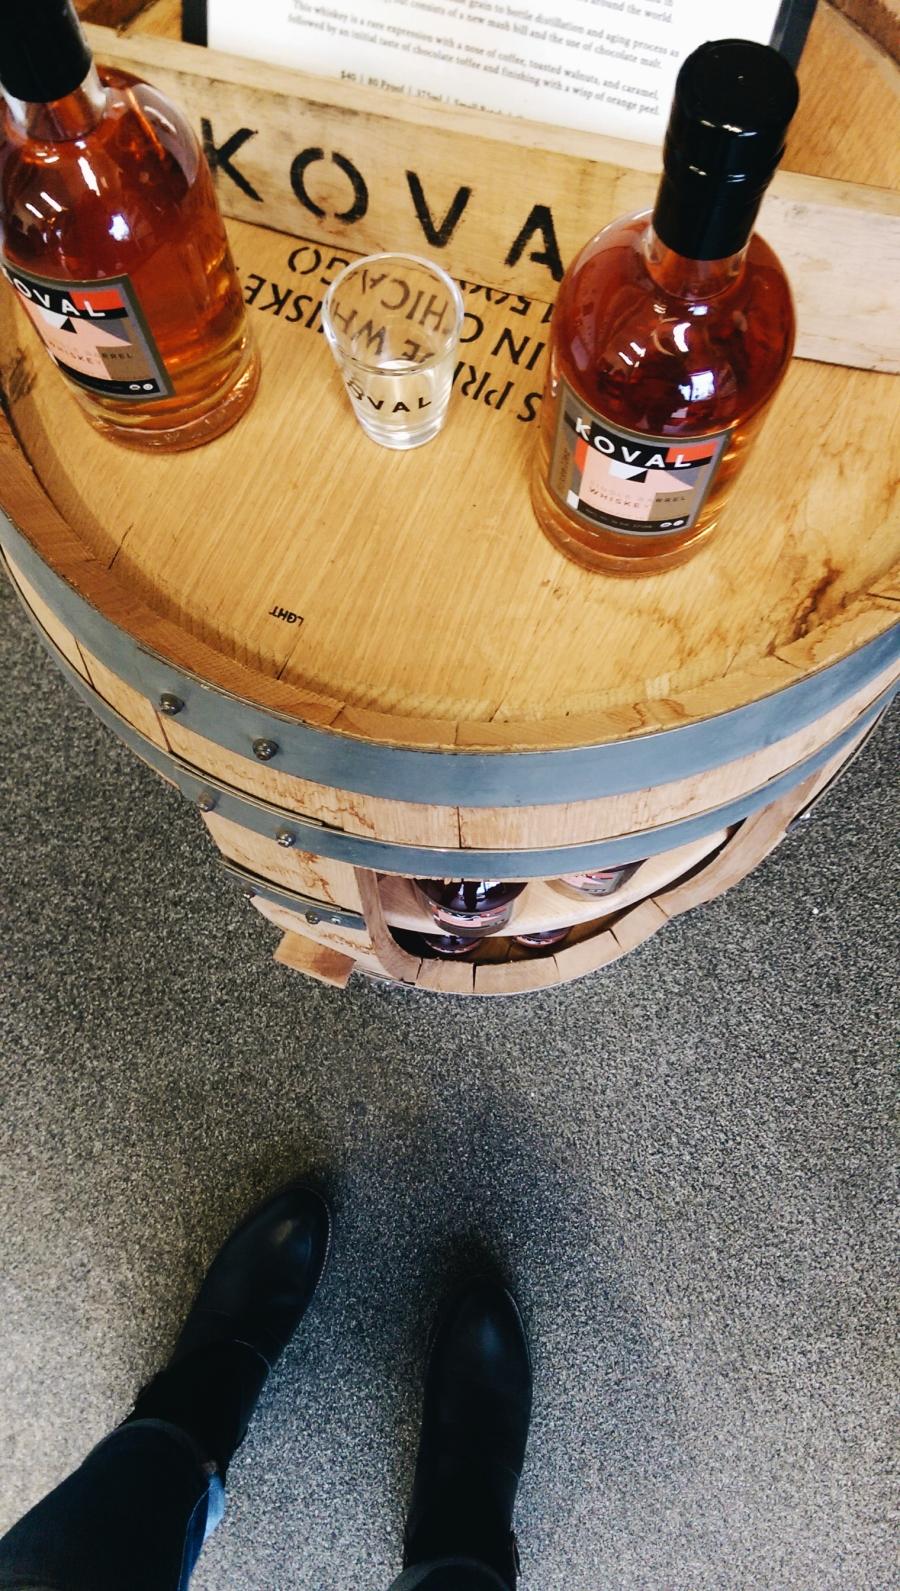 koval distillery tour chicago